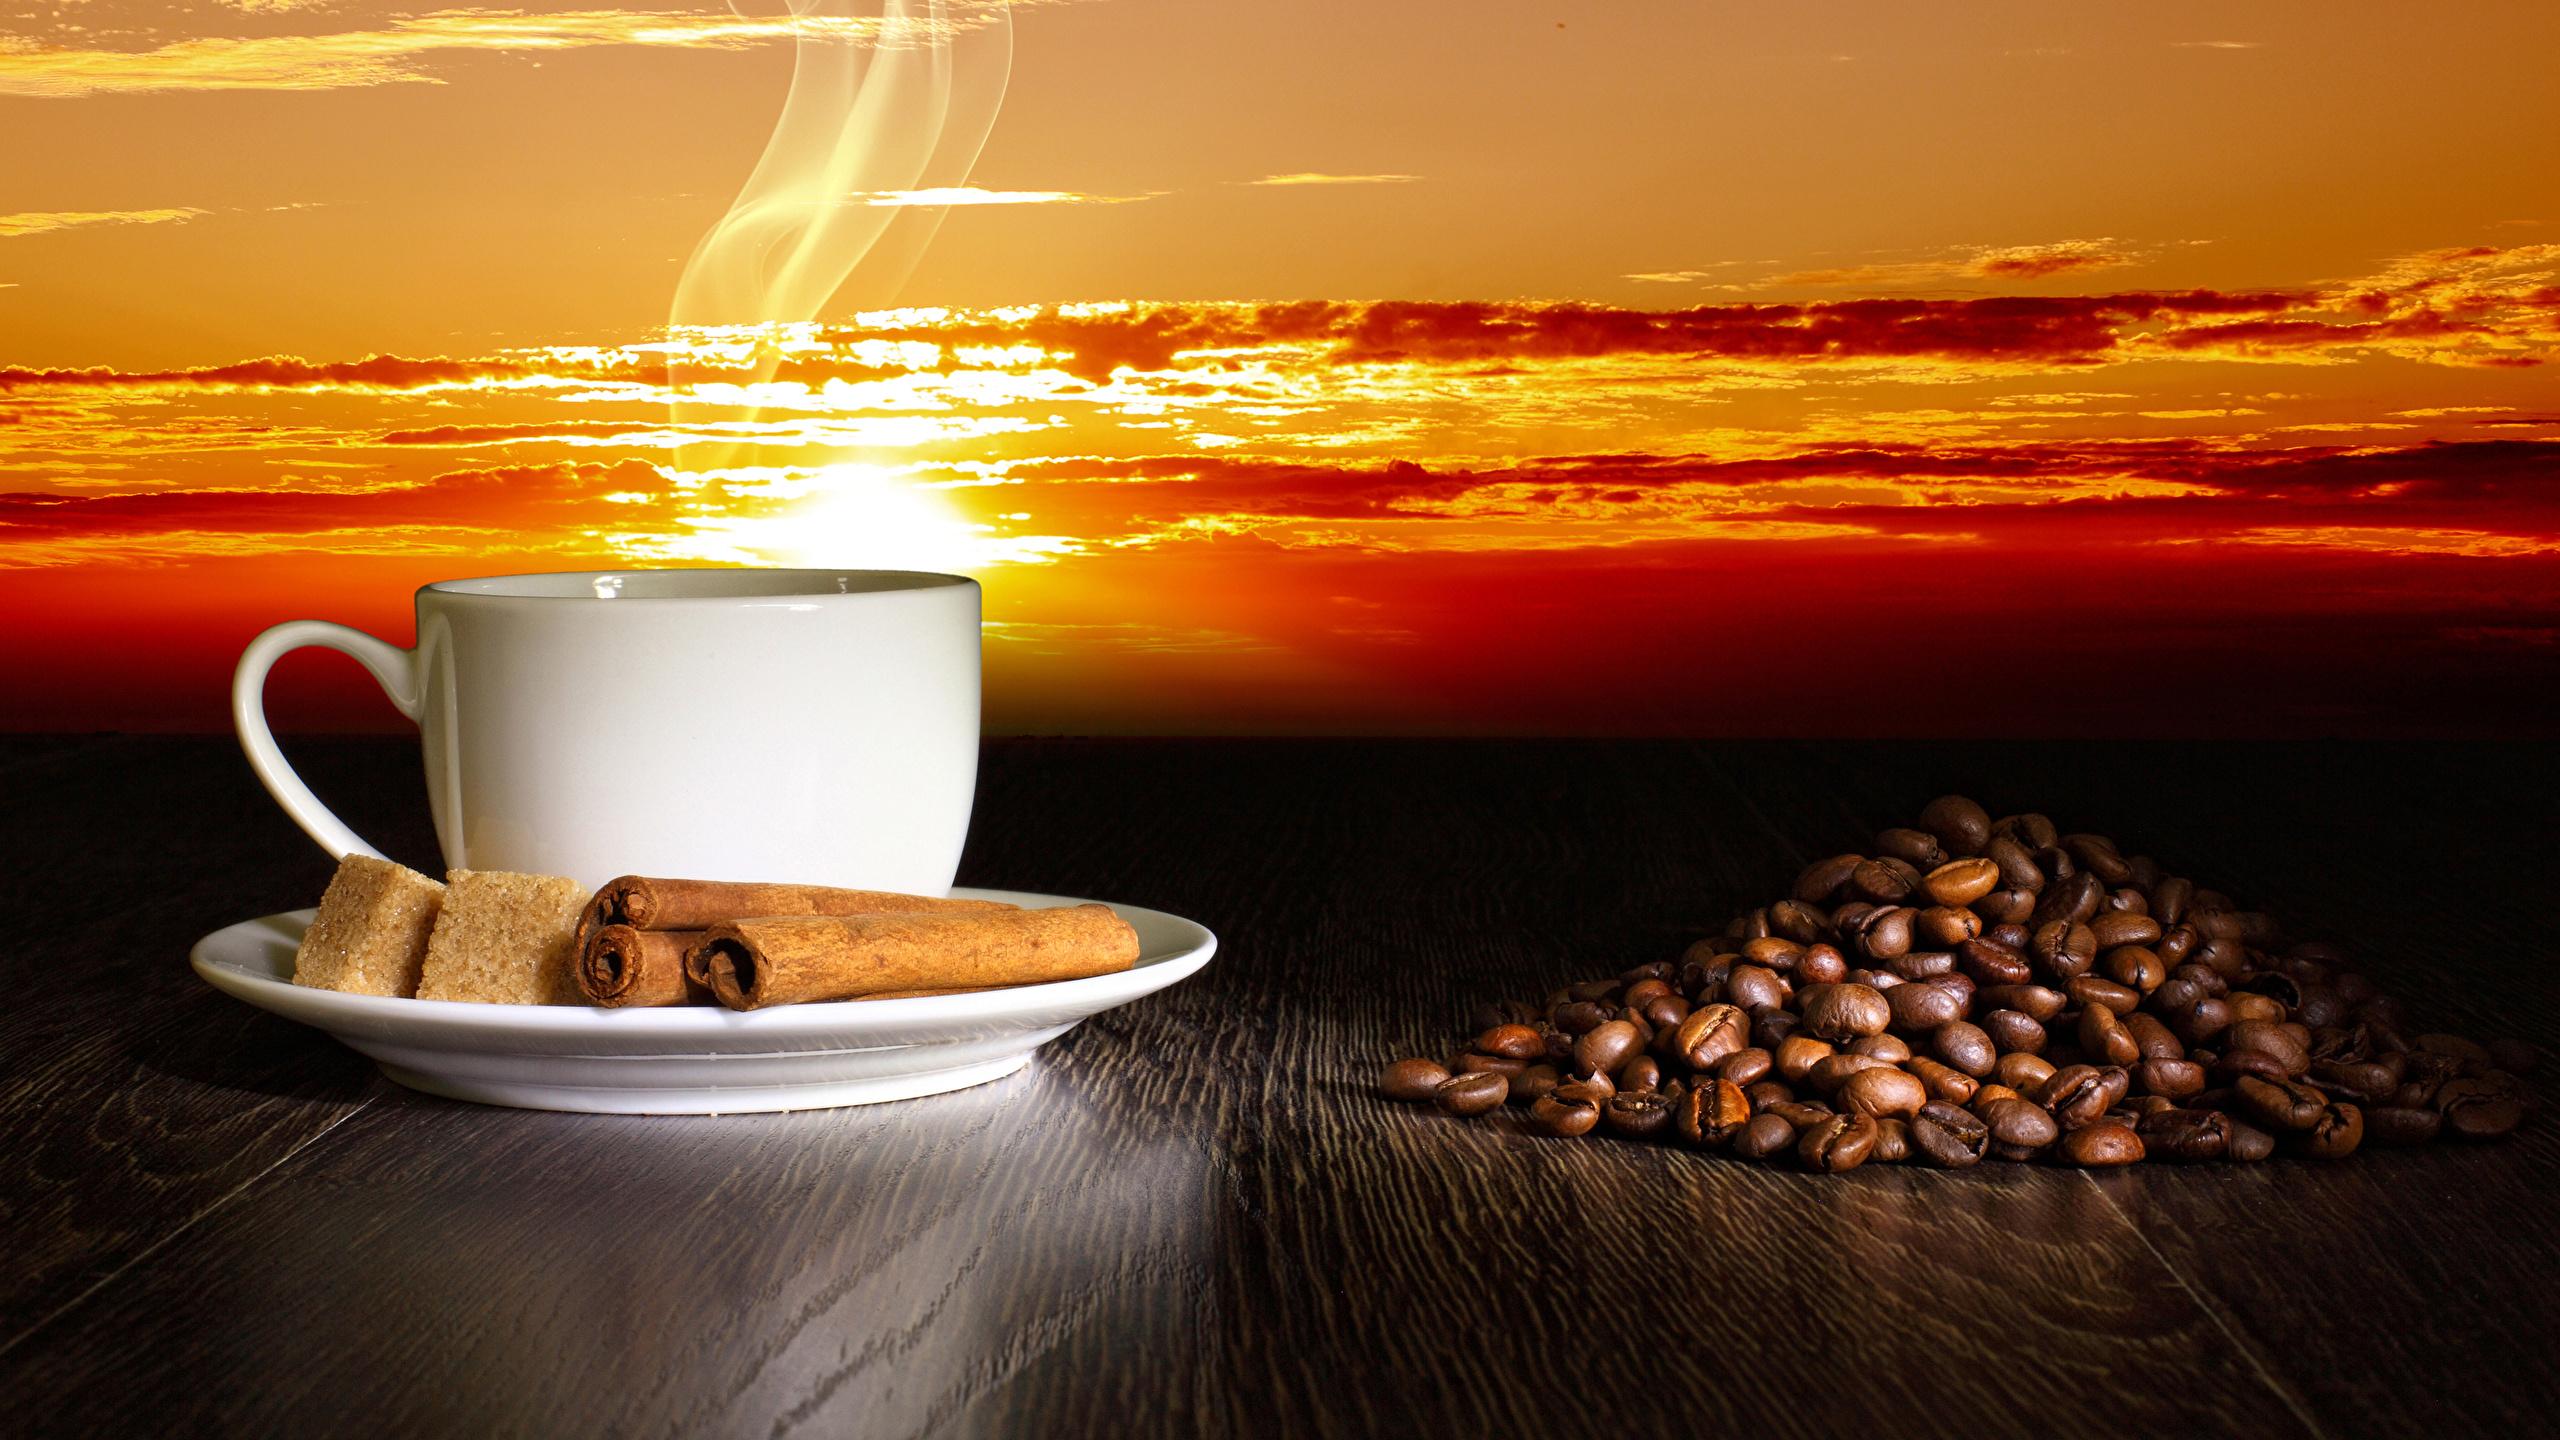 Картинка Кофе Сахар Зерна Корица Пар Чашка Продукты питания 2560x1440 сахара зерно Еда Пища пары паром чашке